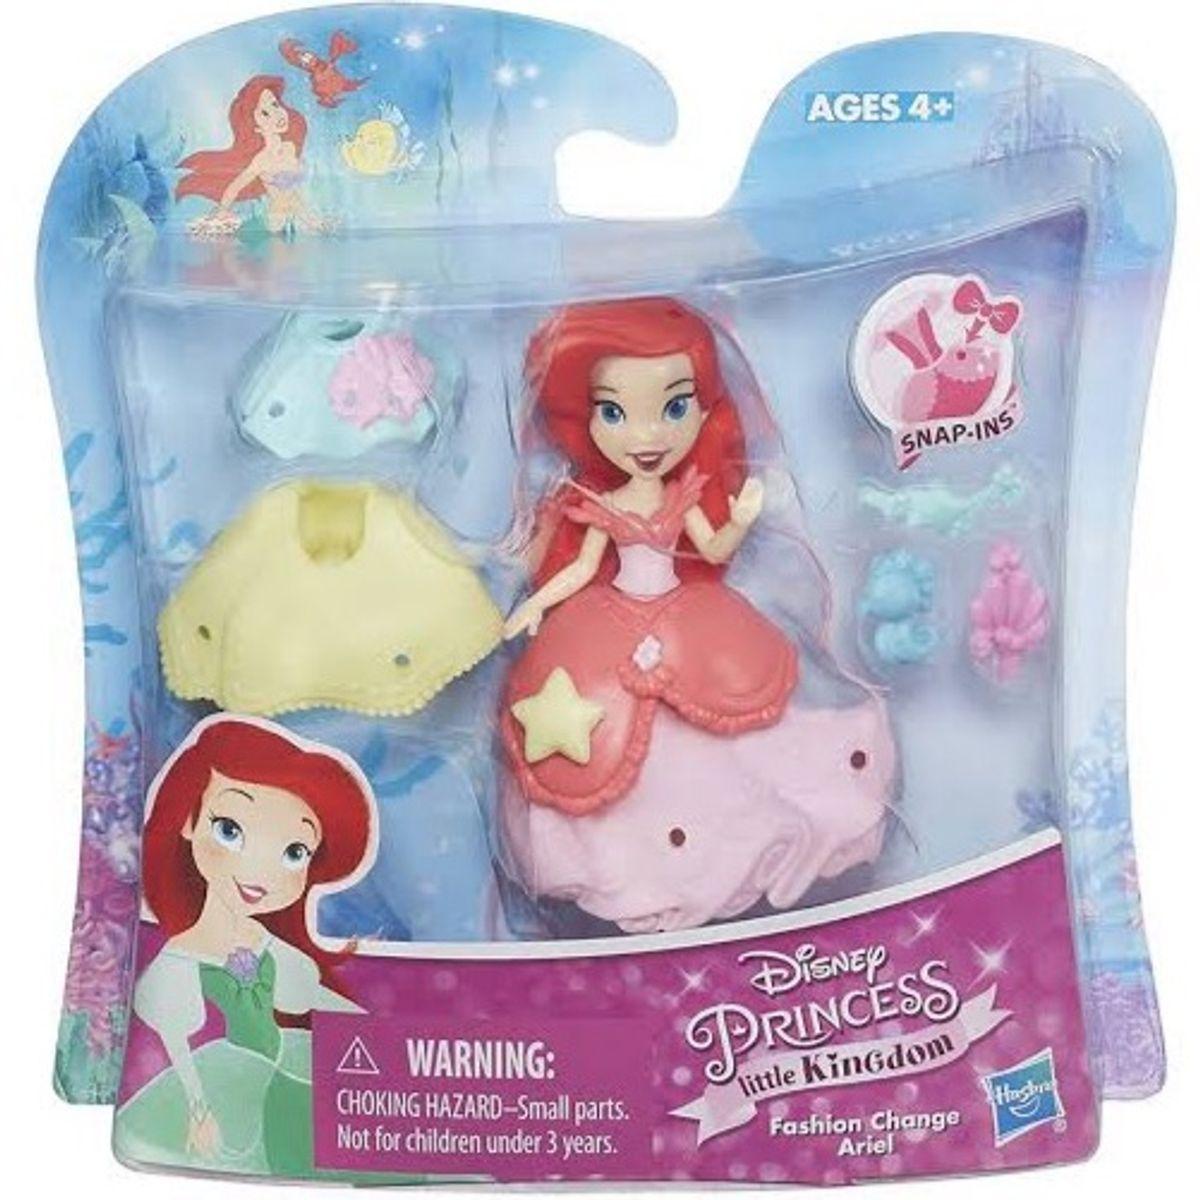 disney princess little kingdom ariel fashion change doll